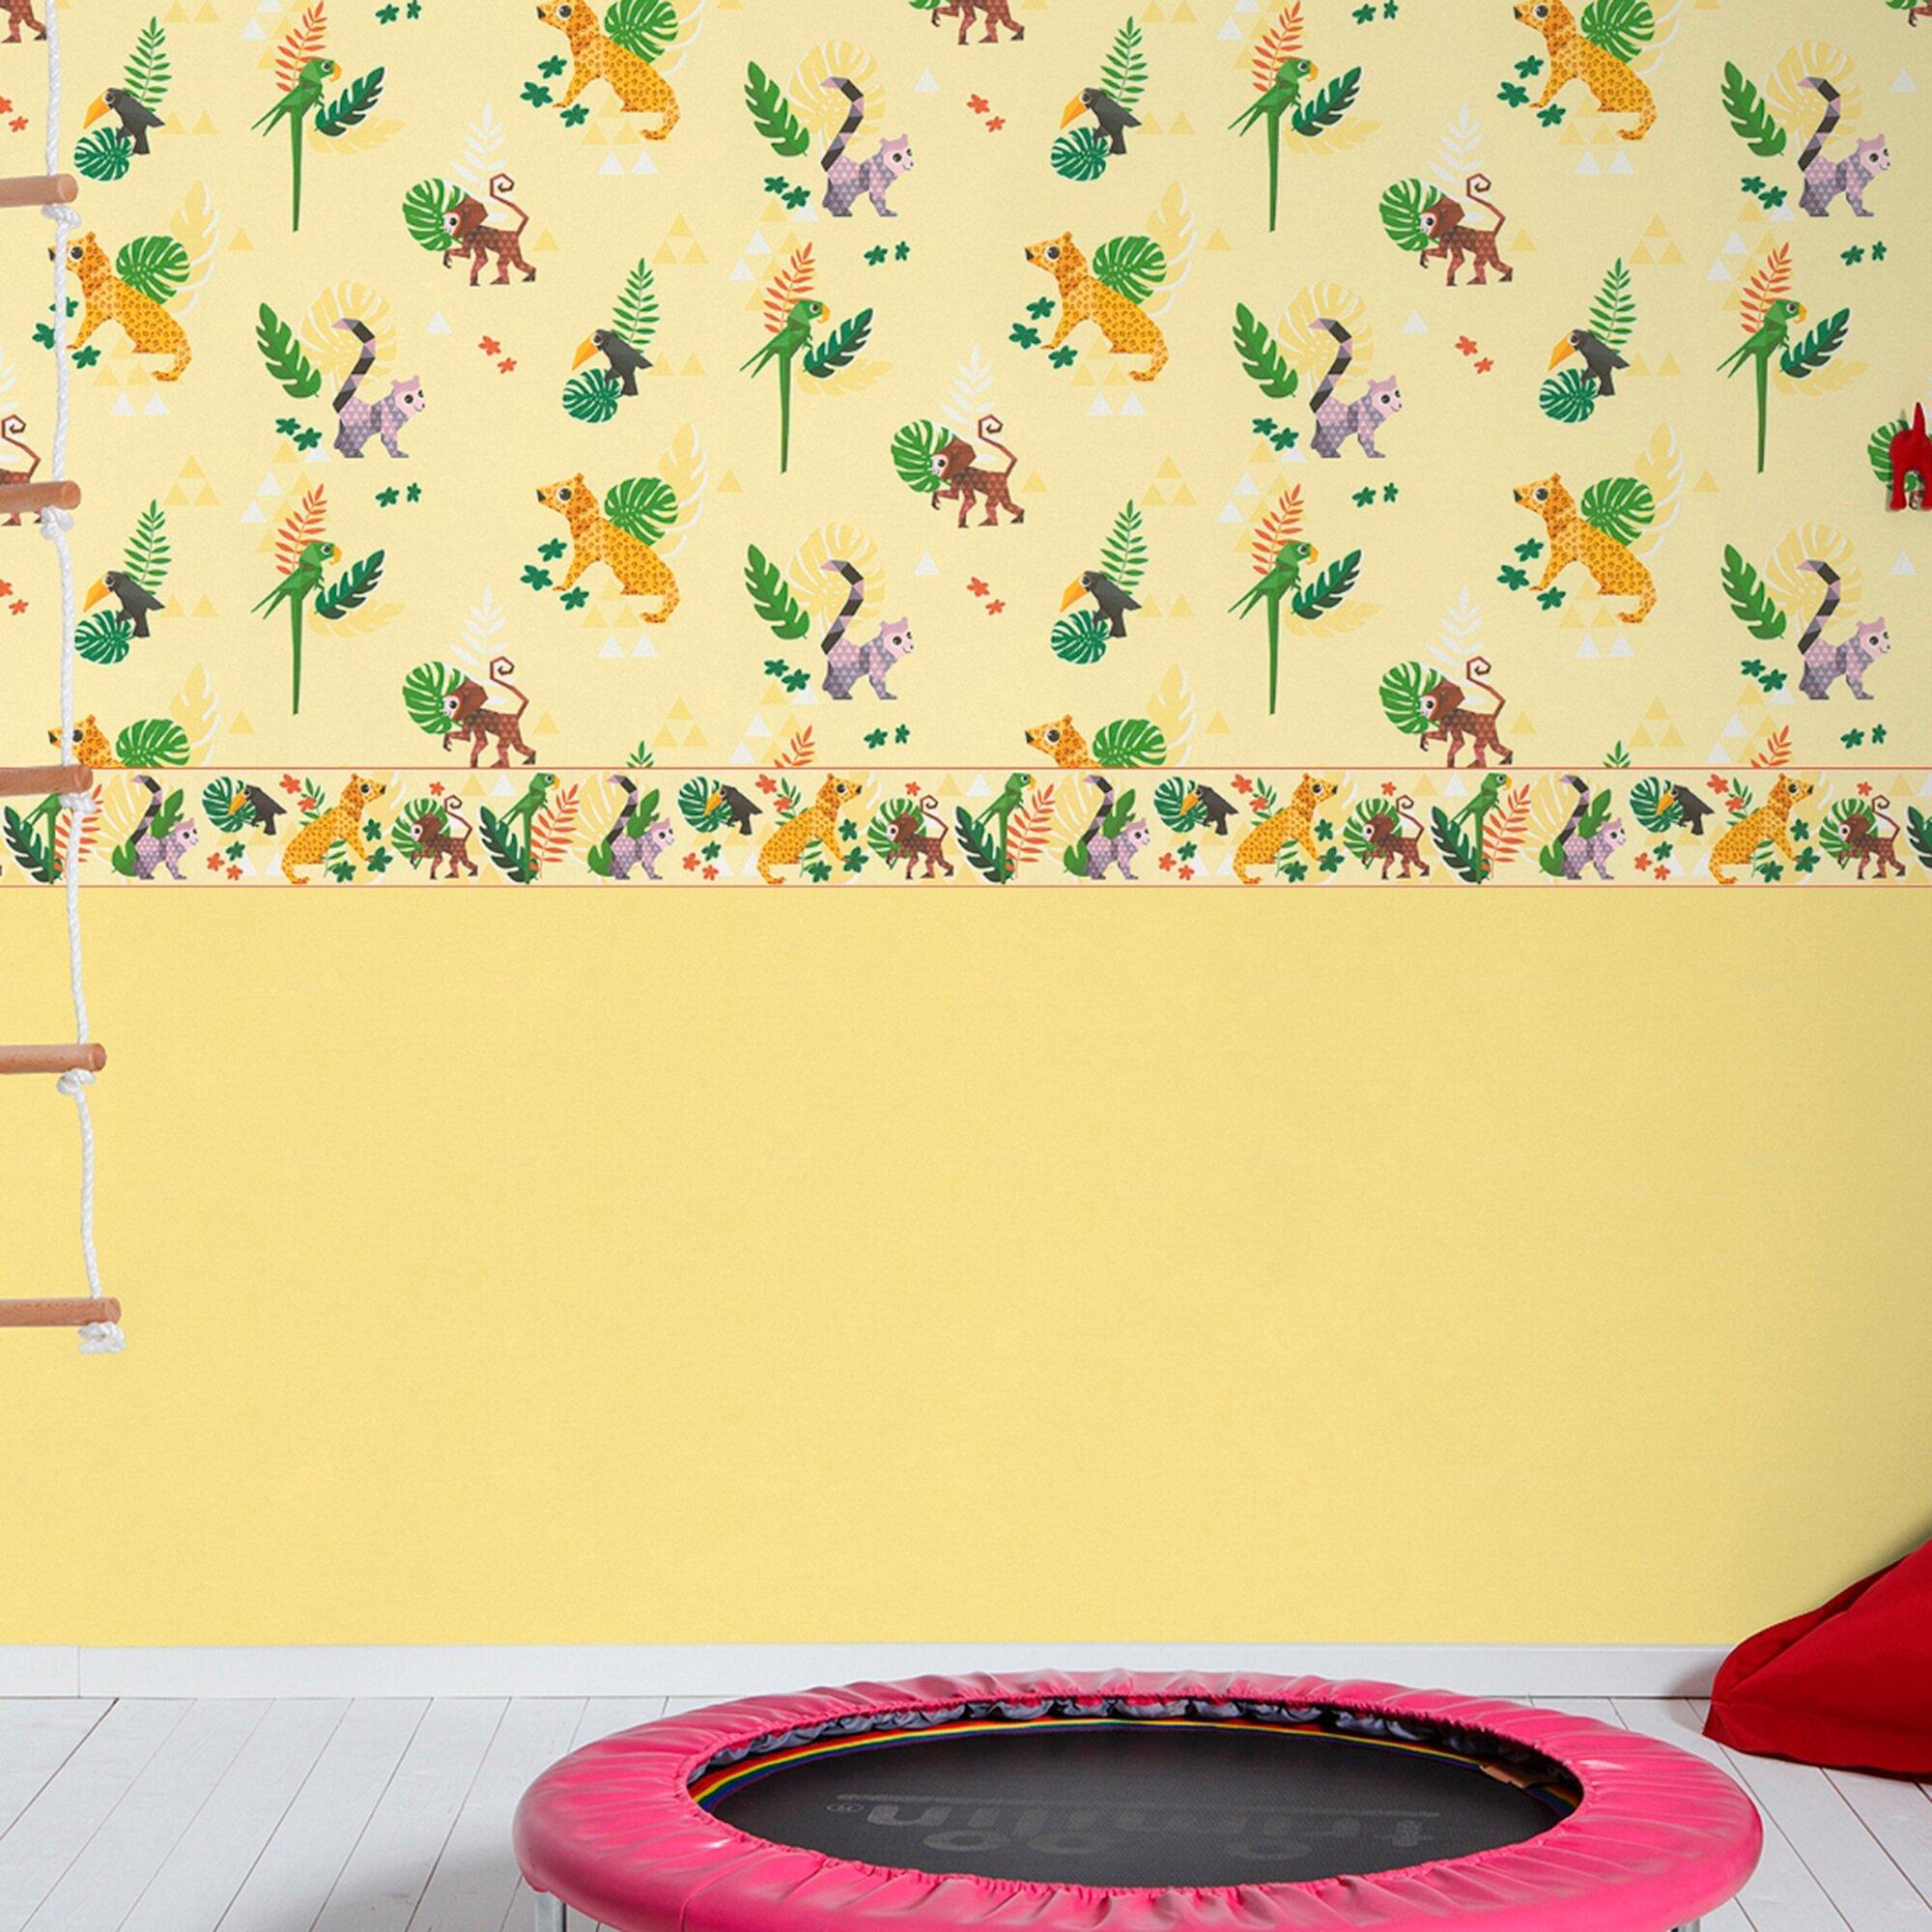 matex-kinderzimmertapete-uni-mehrfarbig, 7.99 EUR @ babywalz-de